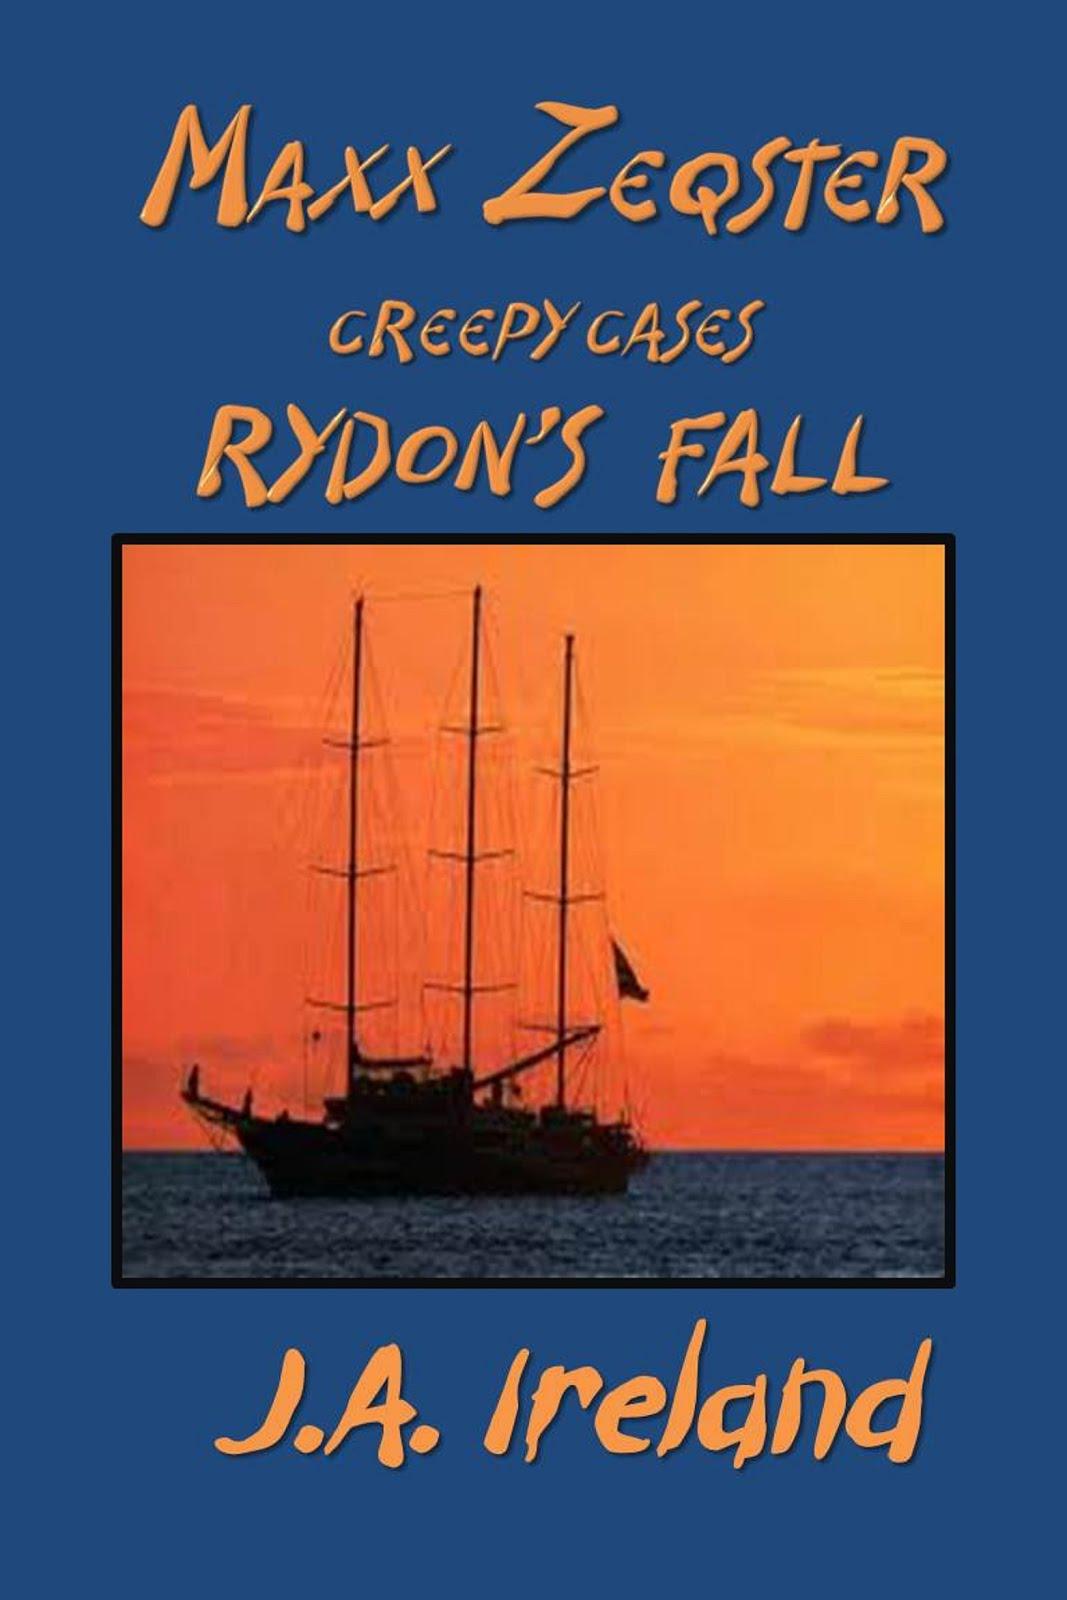 RYDON'S FALL